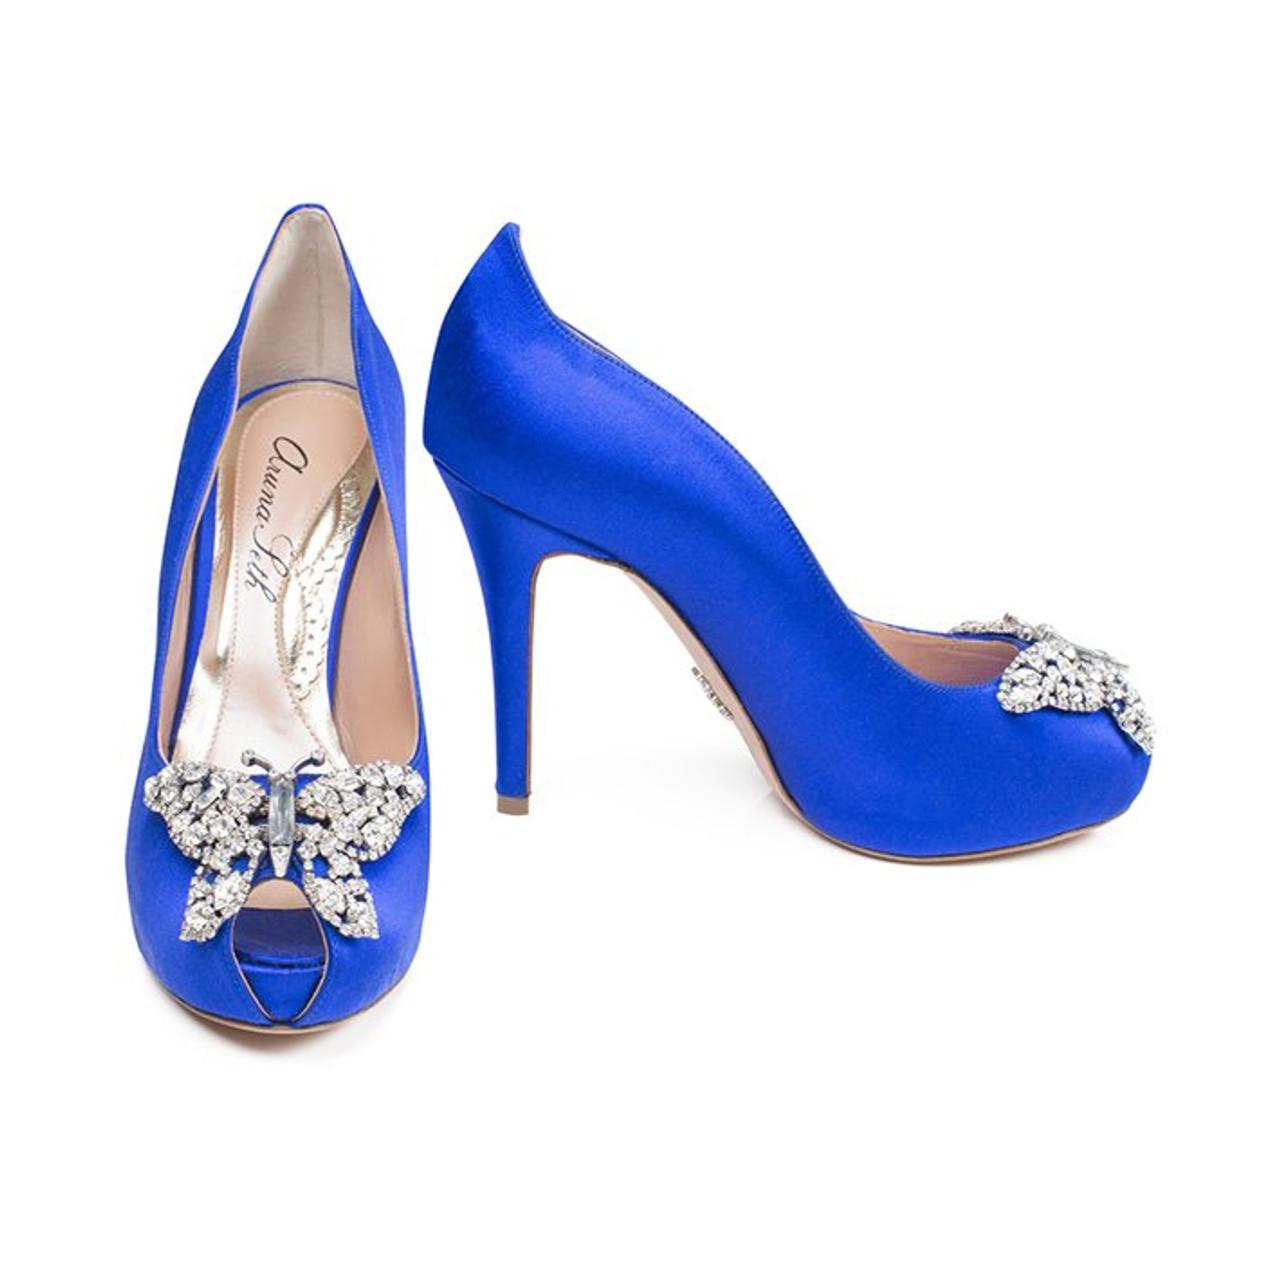 Evi Open Toe Cobalt Blue Satin Platform 110mm